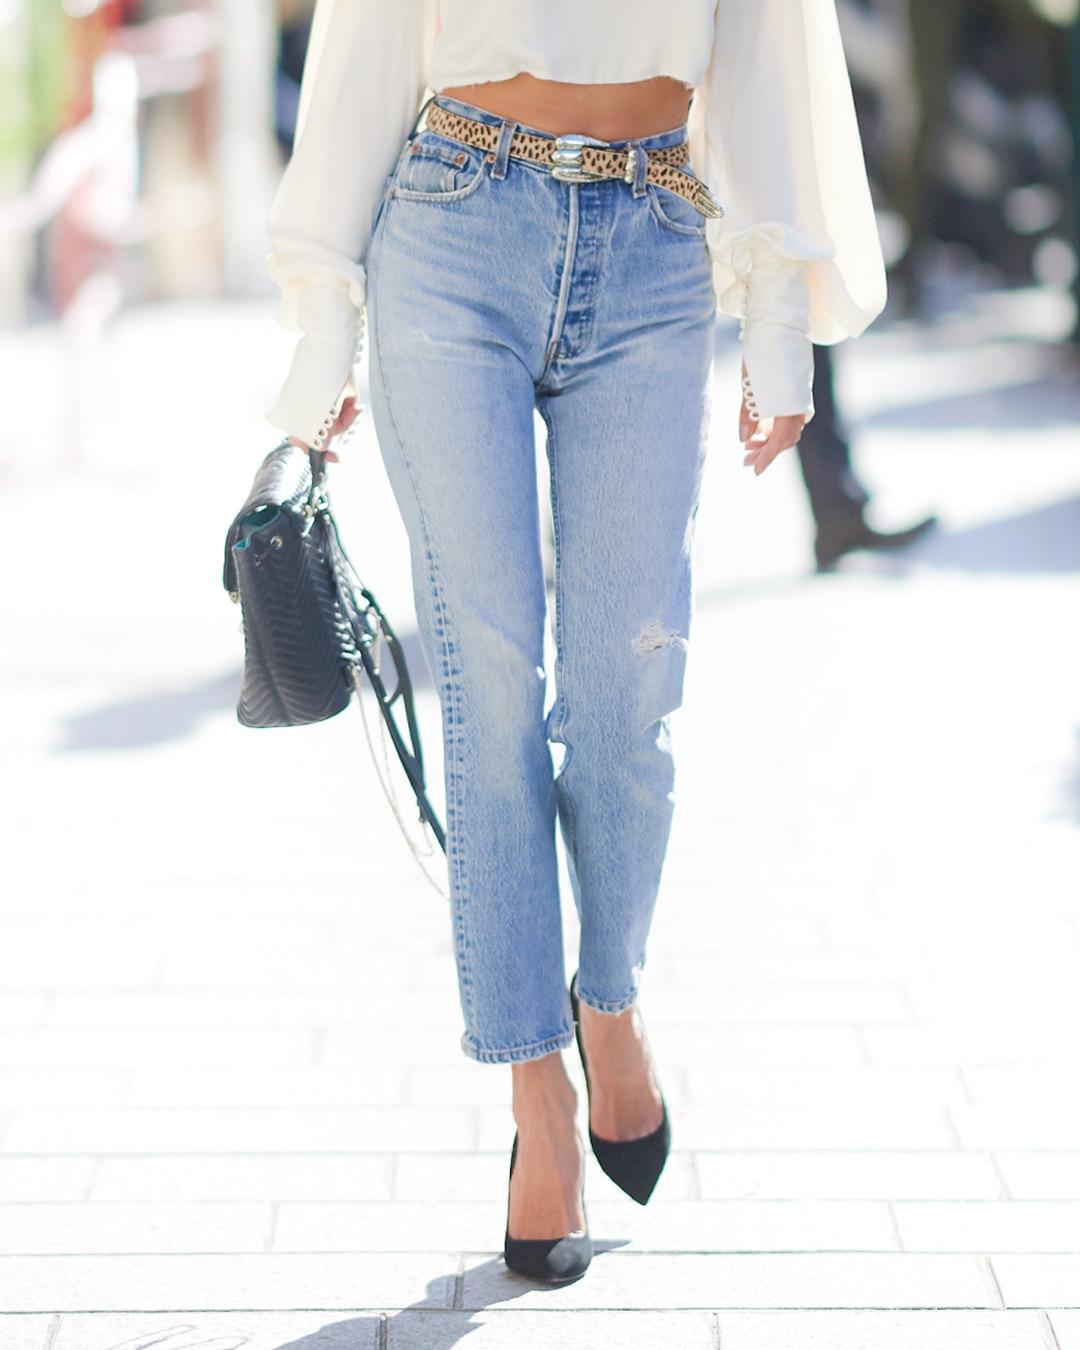 Types Boyfriend Body E For 12 Jeans News Comfy All xYR1ZSqnCw